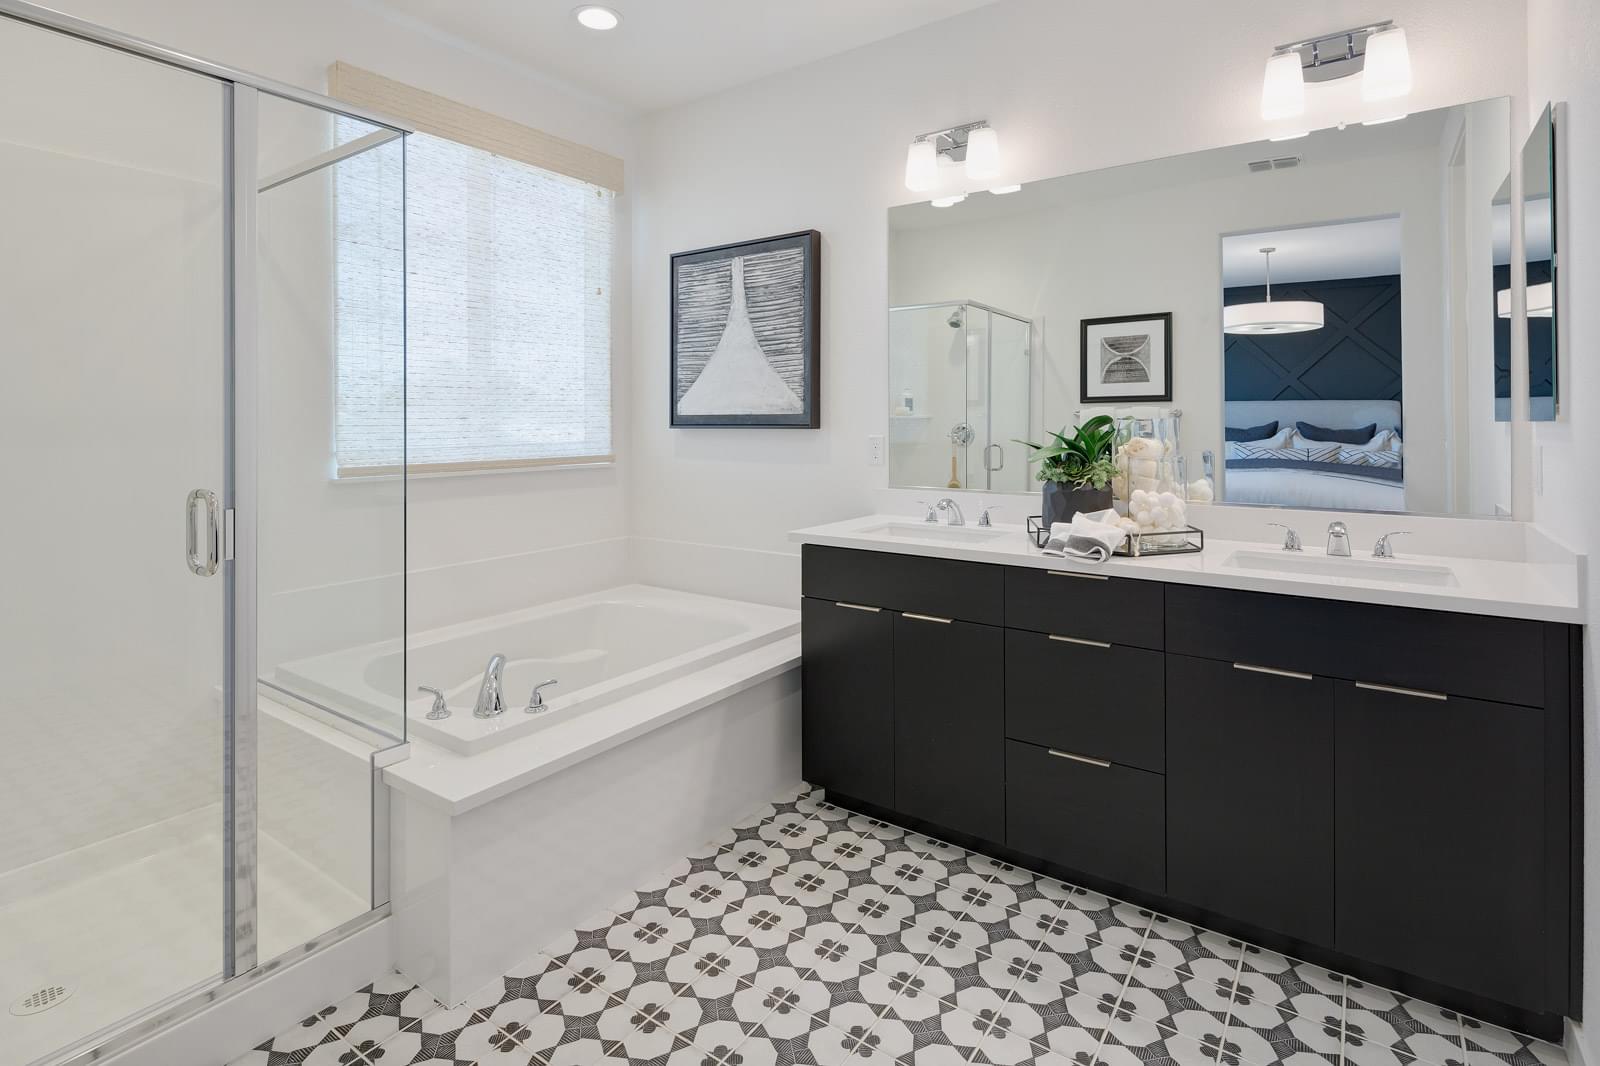 Residence 2 Owner's Bath